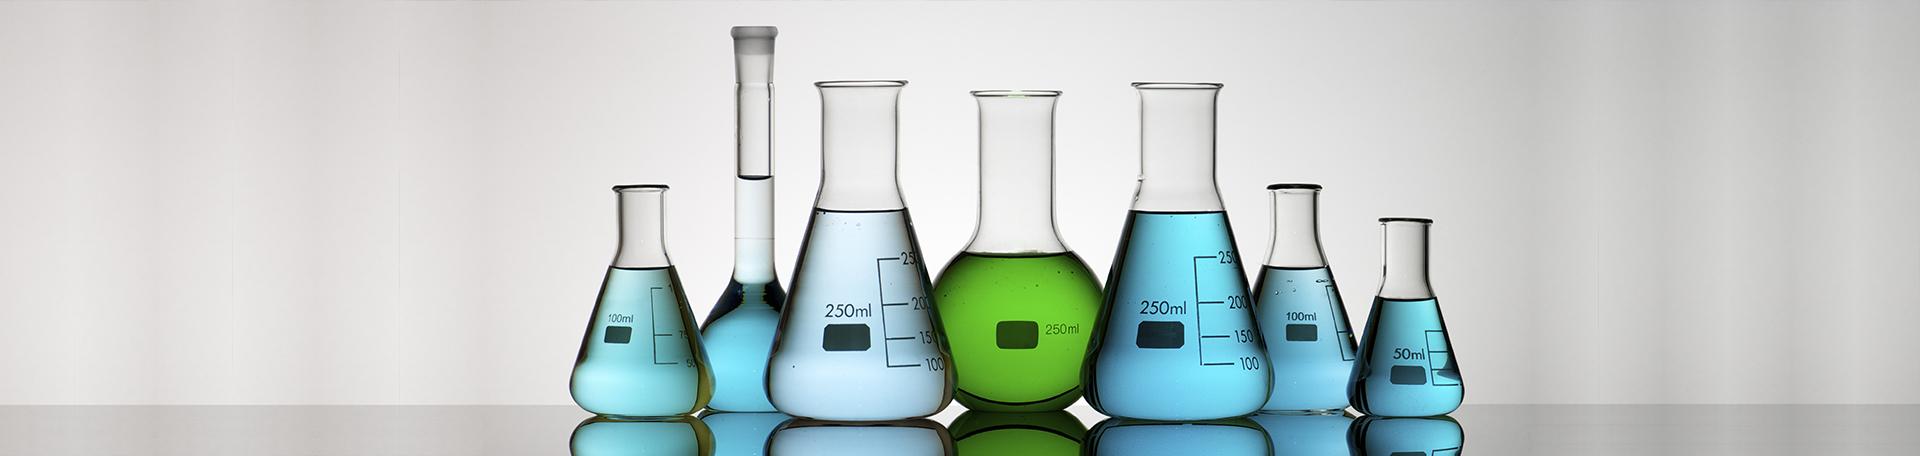 Glass flasks SiChem laboratory